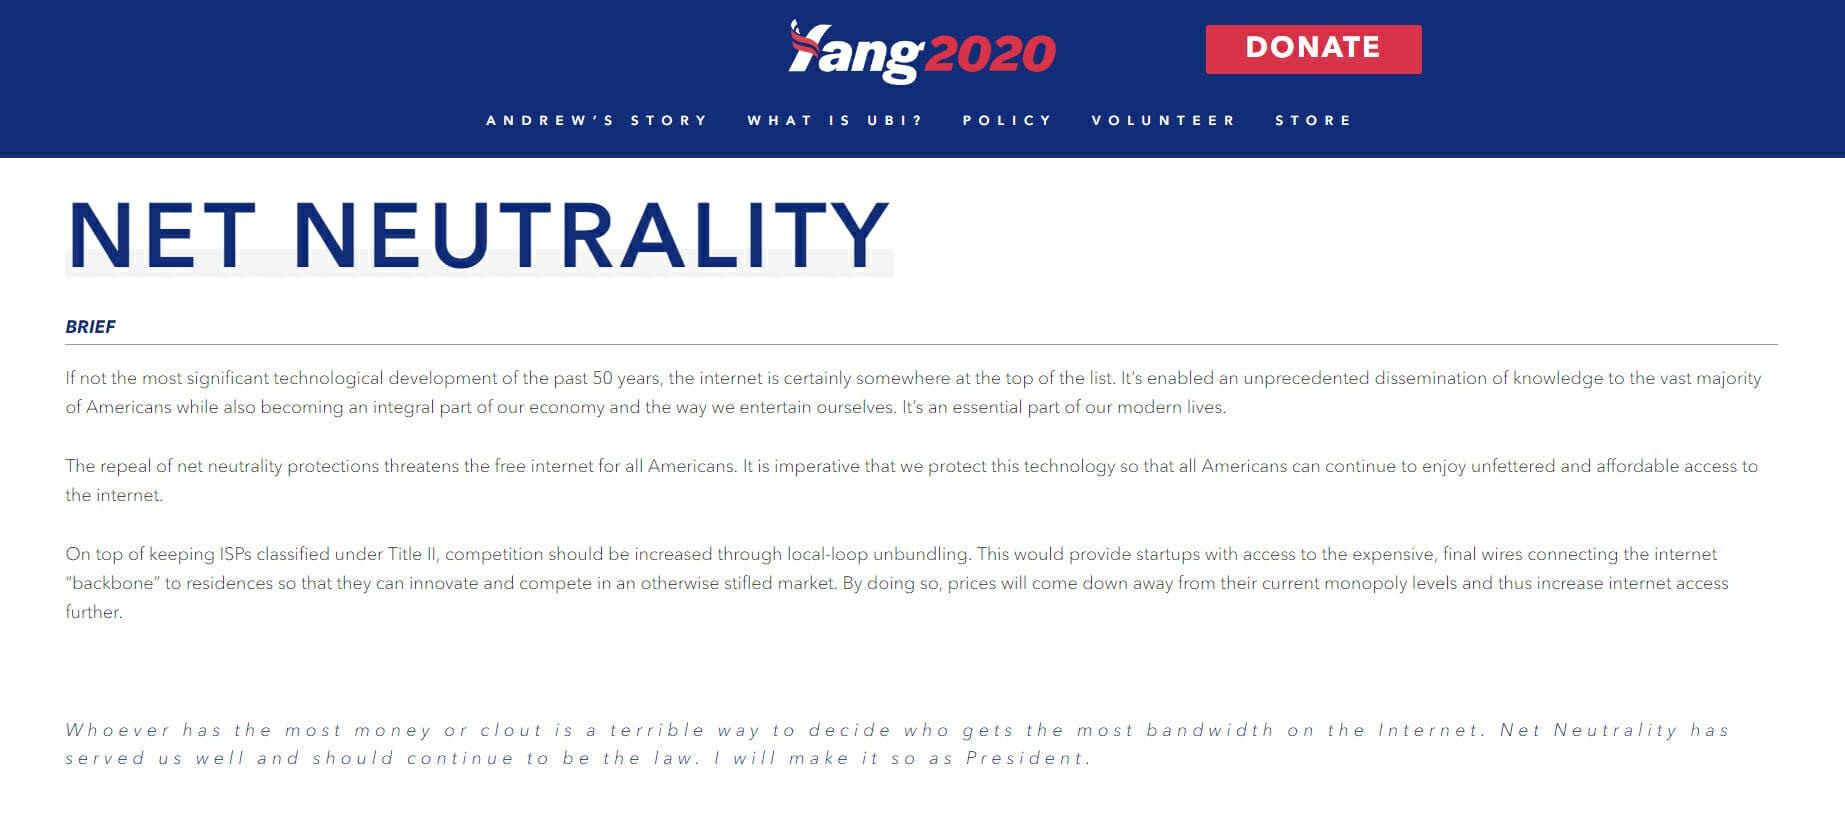 Andrew Yang 2020 Net Neutrality